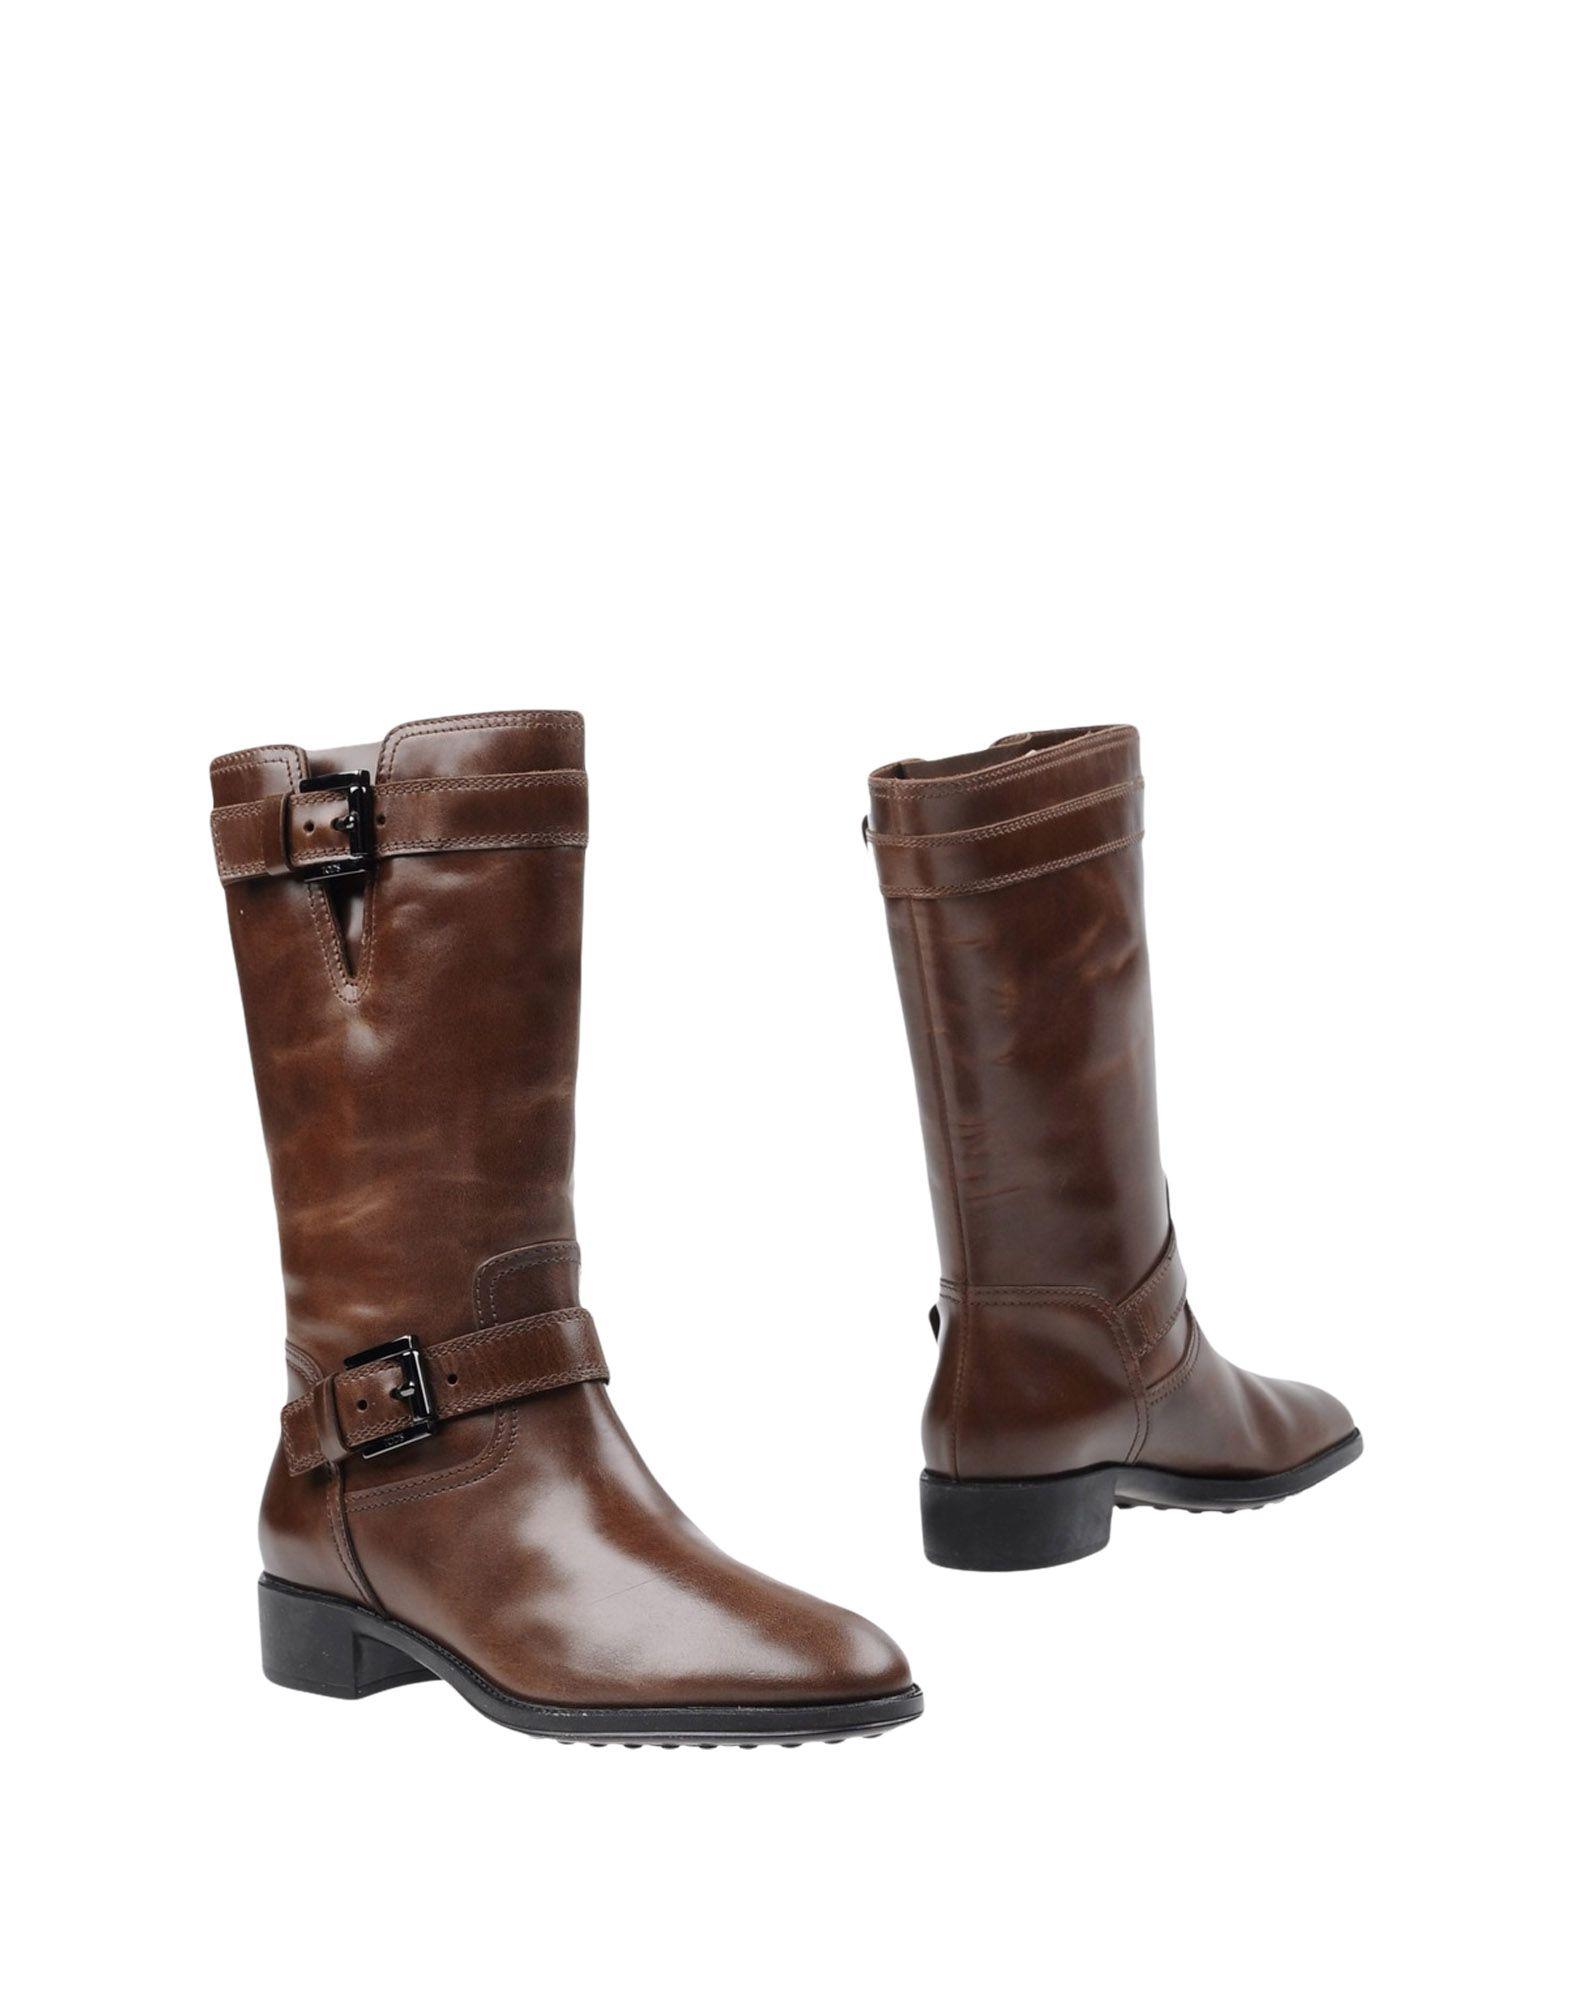 11362378TB Tod's Stiefel Damen  11362378TB  Heiße Schuhe 510dd2